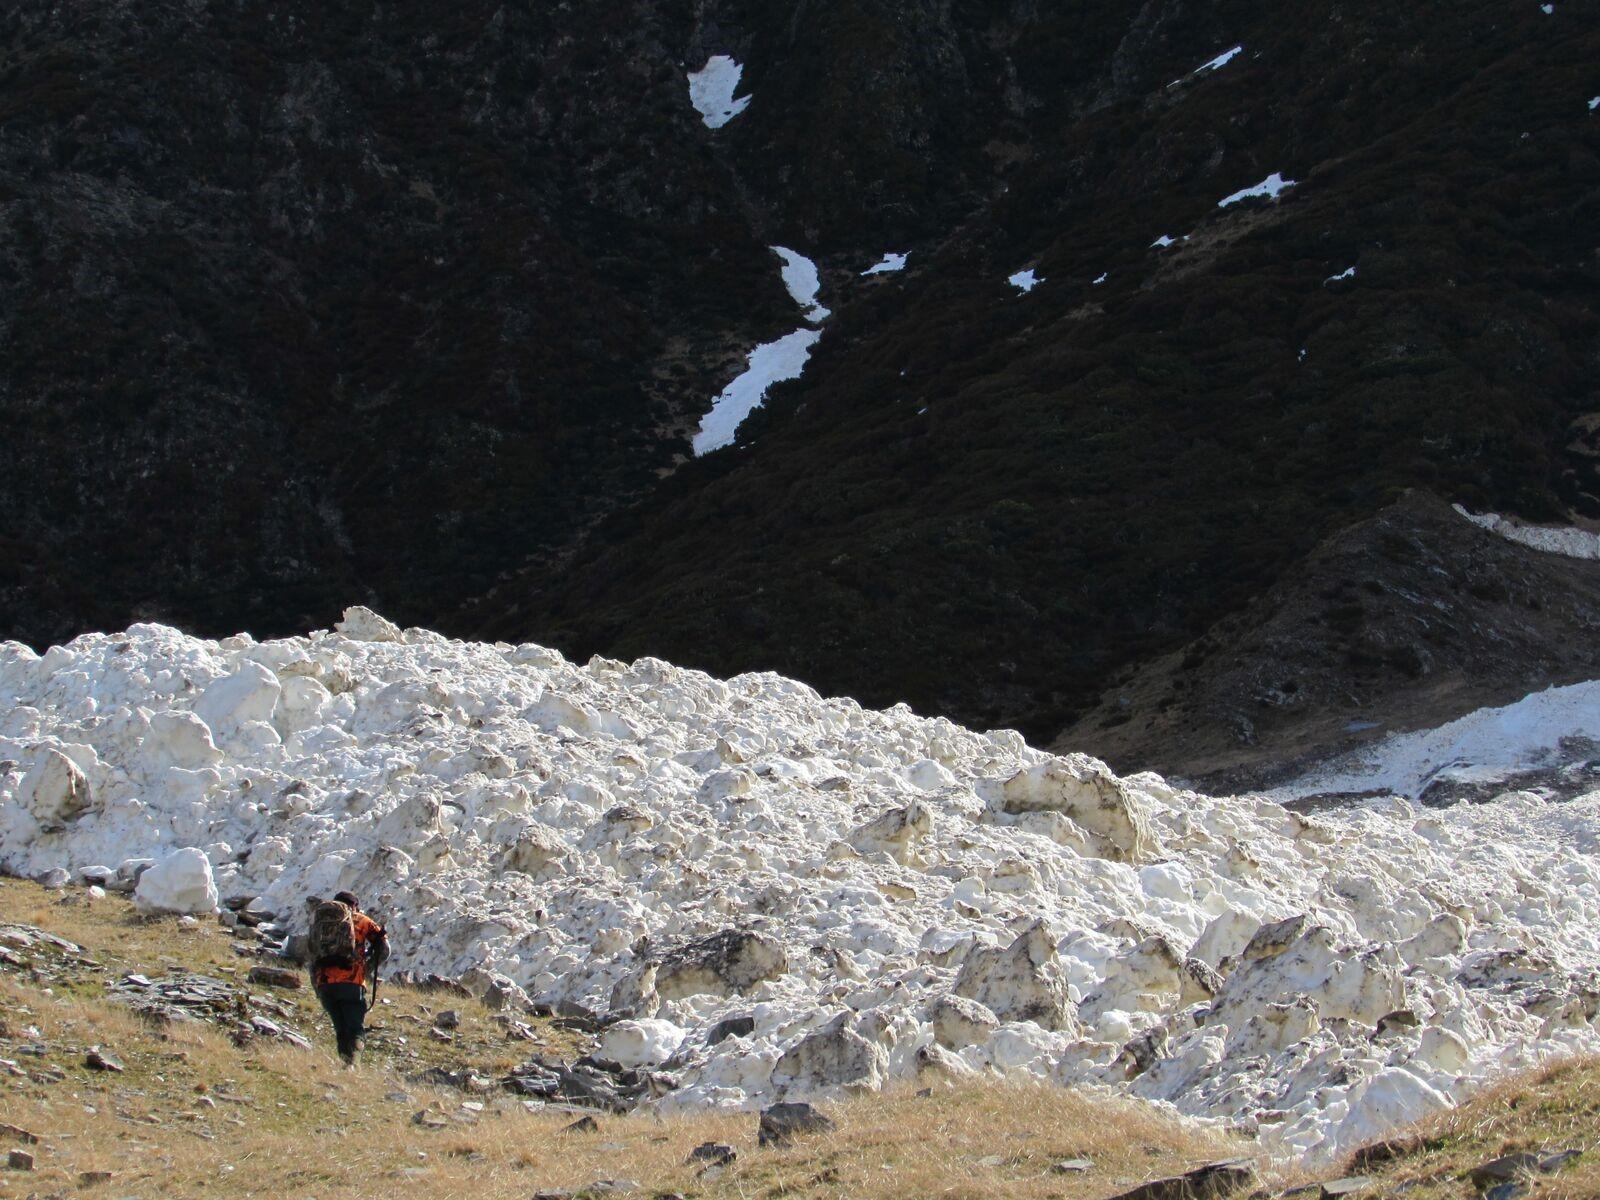 Avalanche debris - image @ R Wells